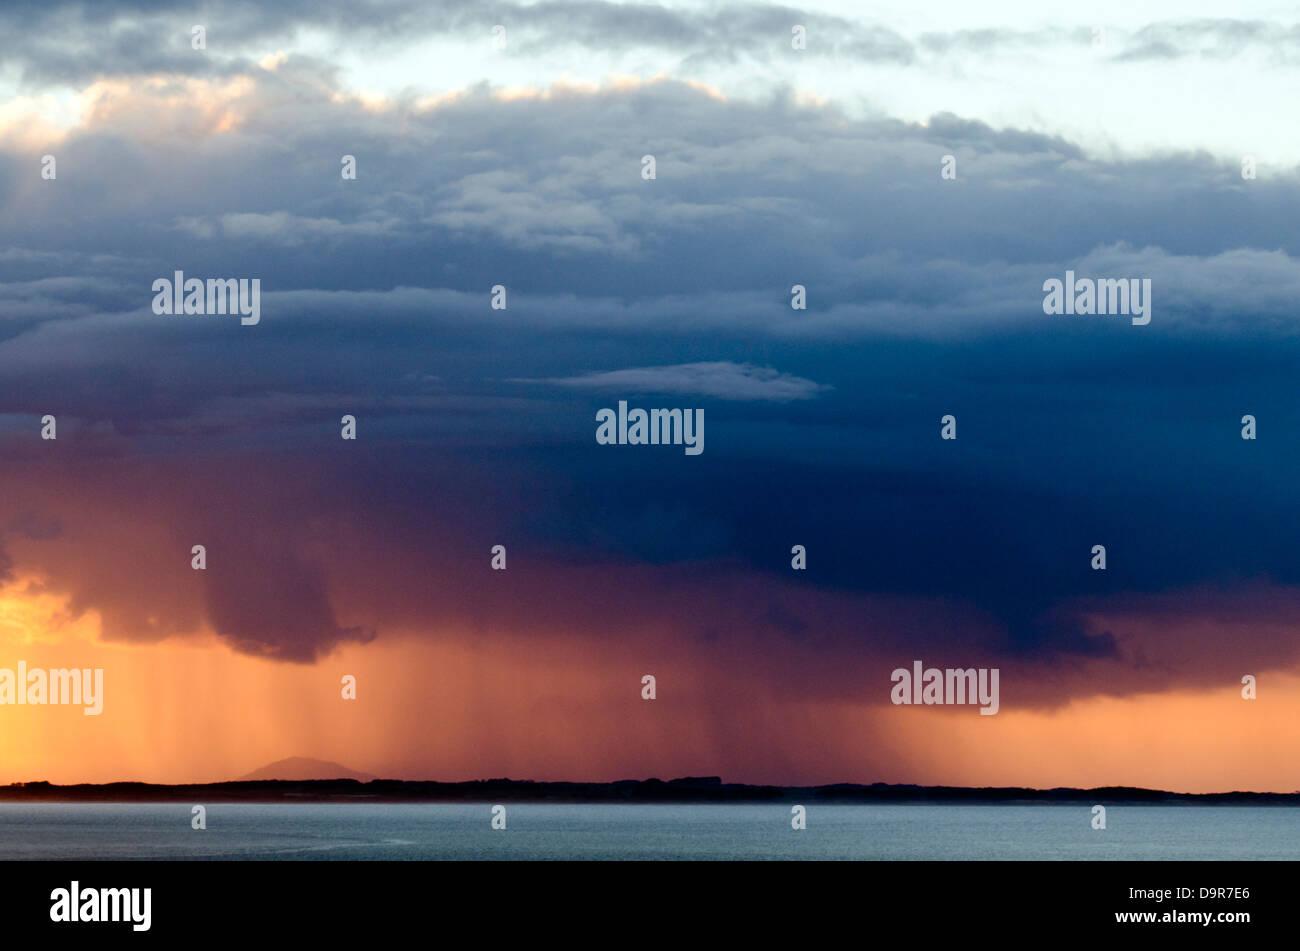 Great dark gray stormy cloud puring rain above the ocean. - Stock Image